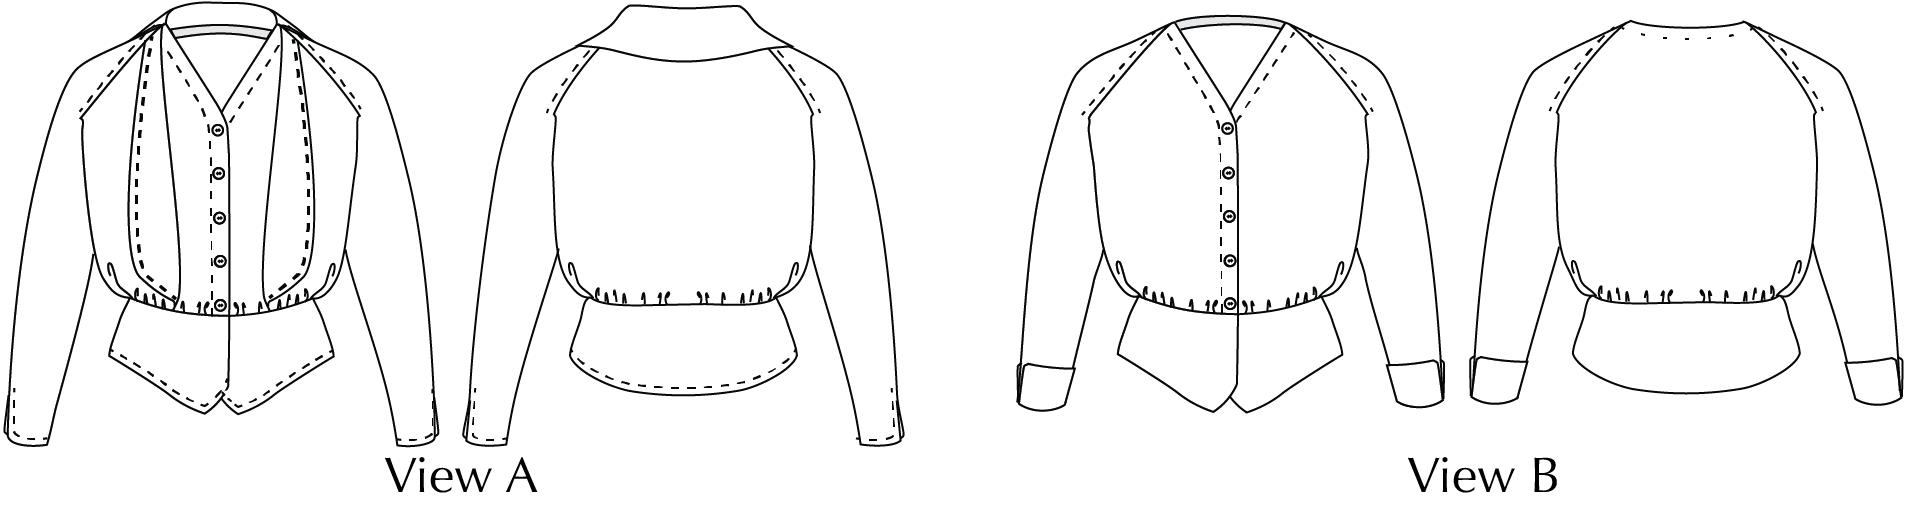 Selina Line Drawings ScroopPatterns.com